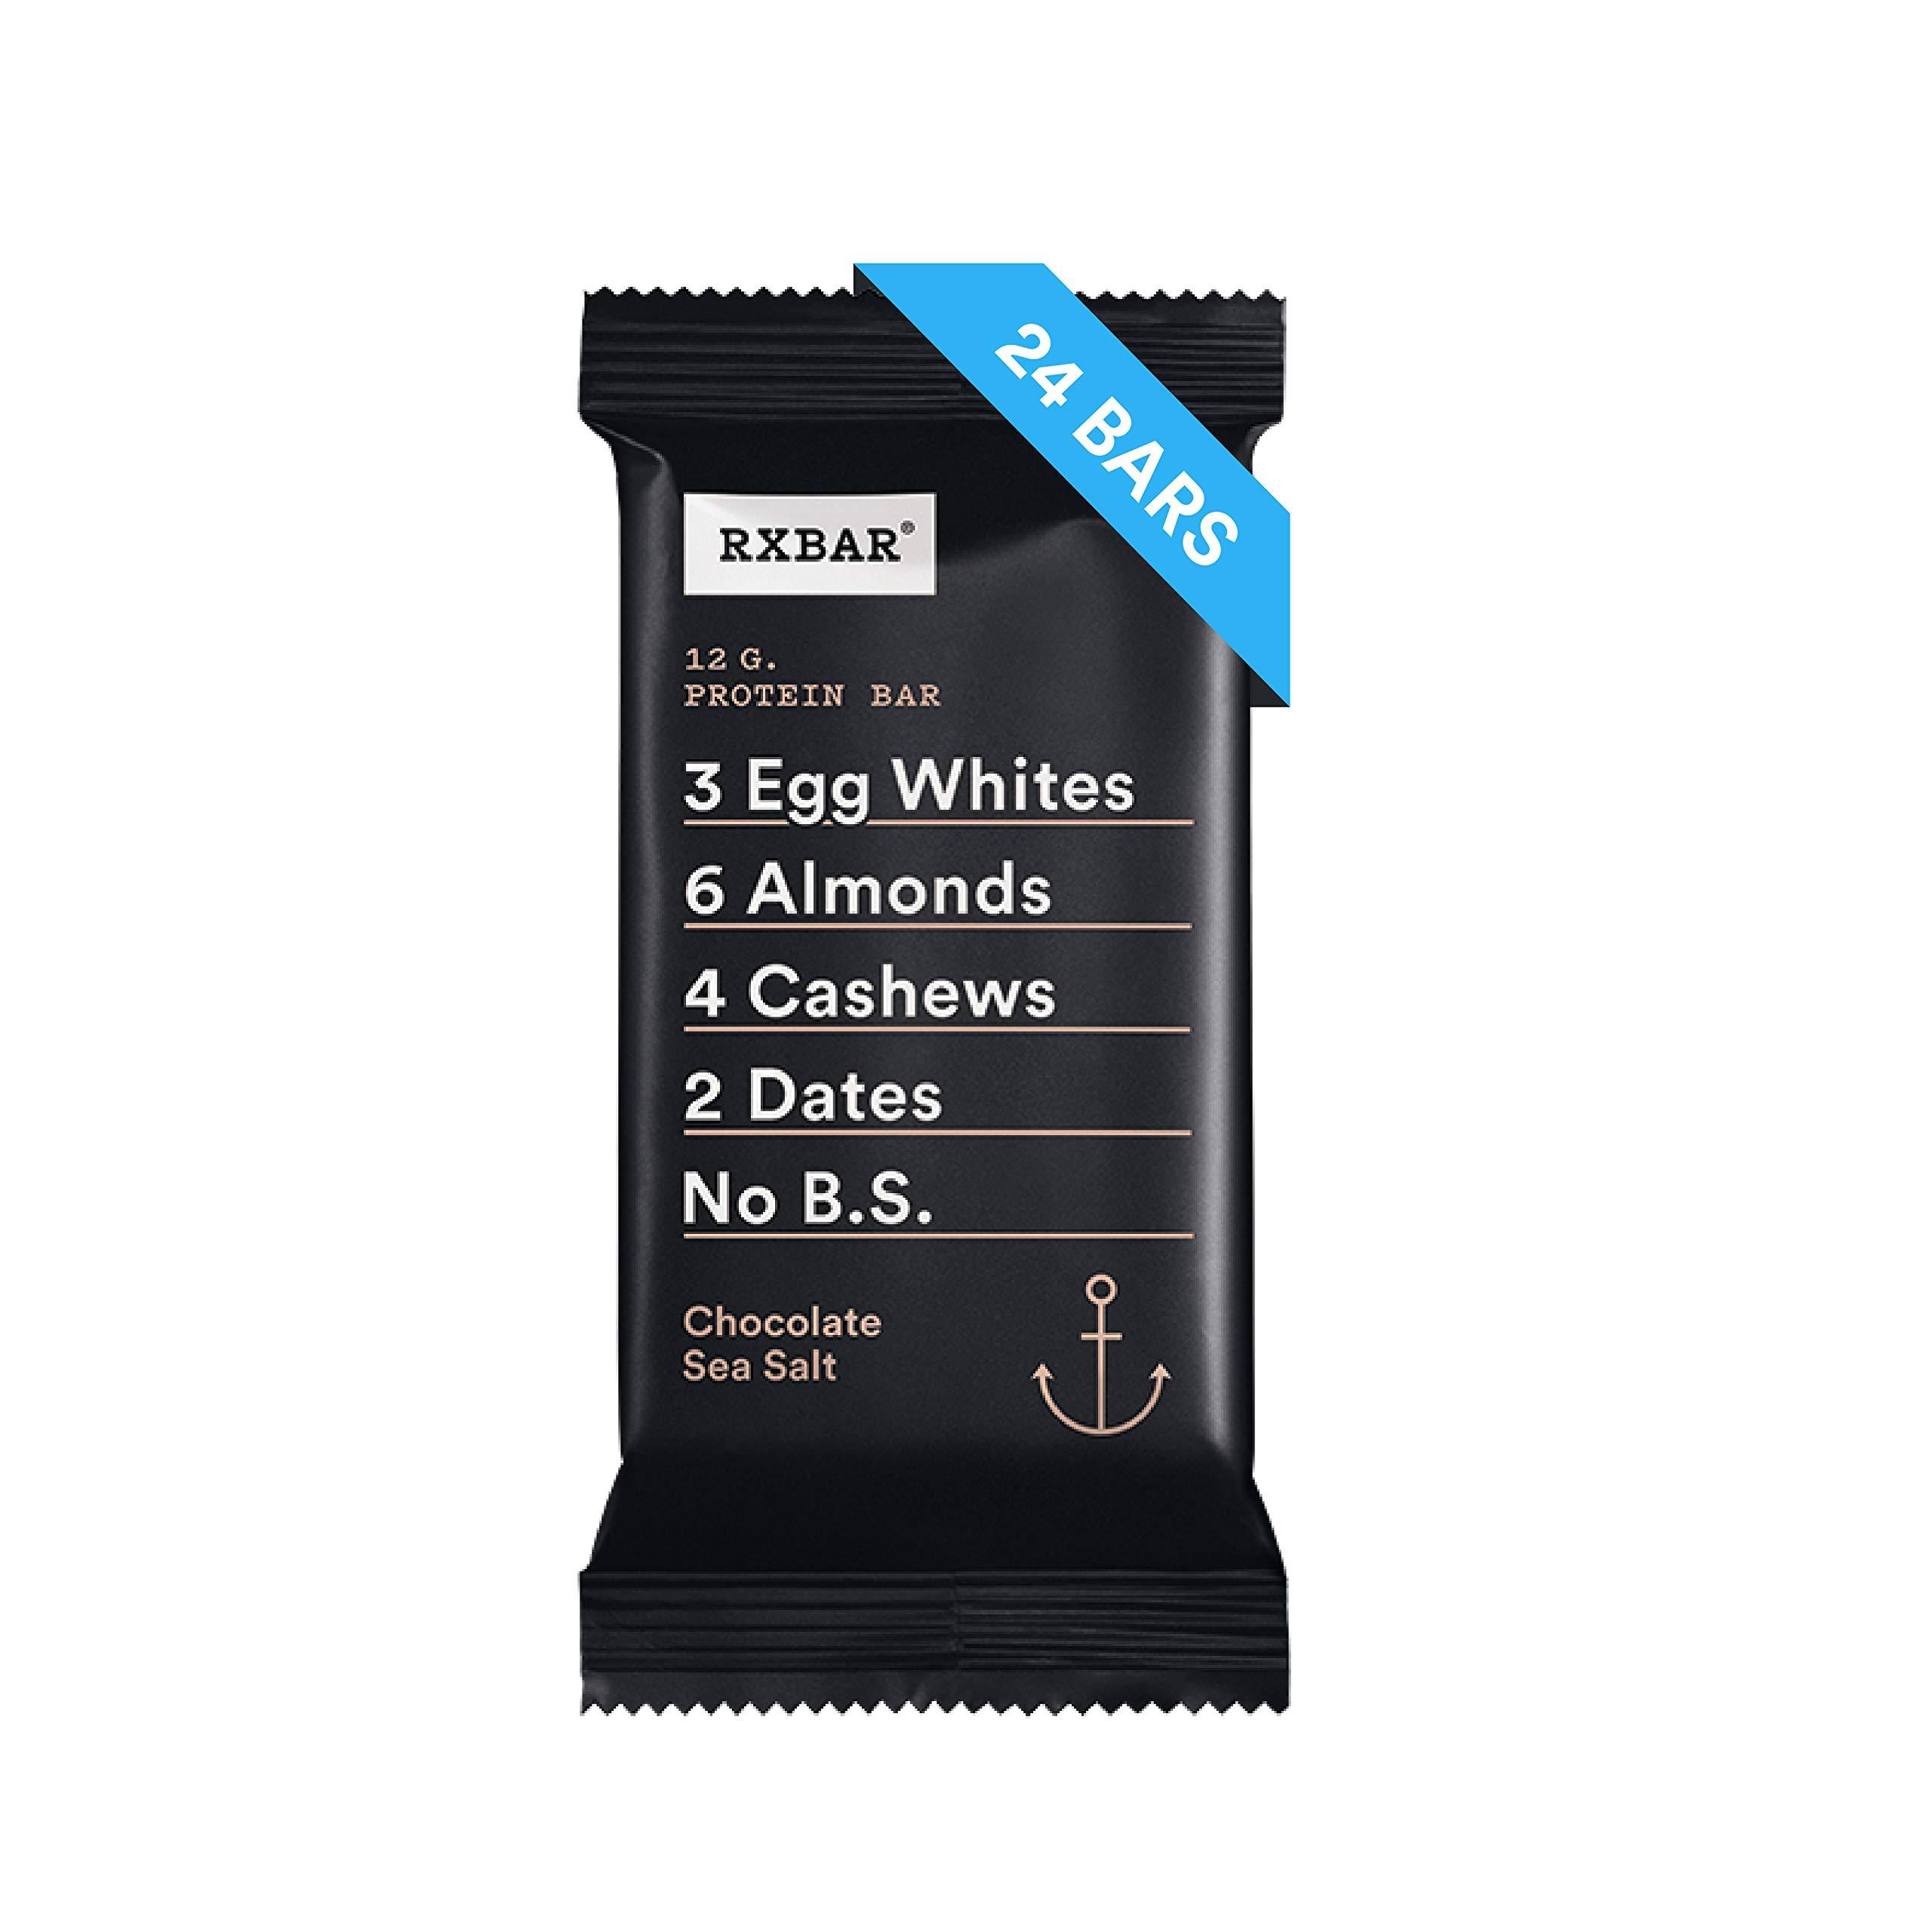 RXBAR Chocolate Sea Salt, Breakfast Bar, High Protein Snack, 24 Count by RXBAR